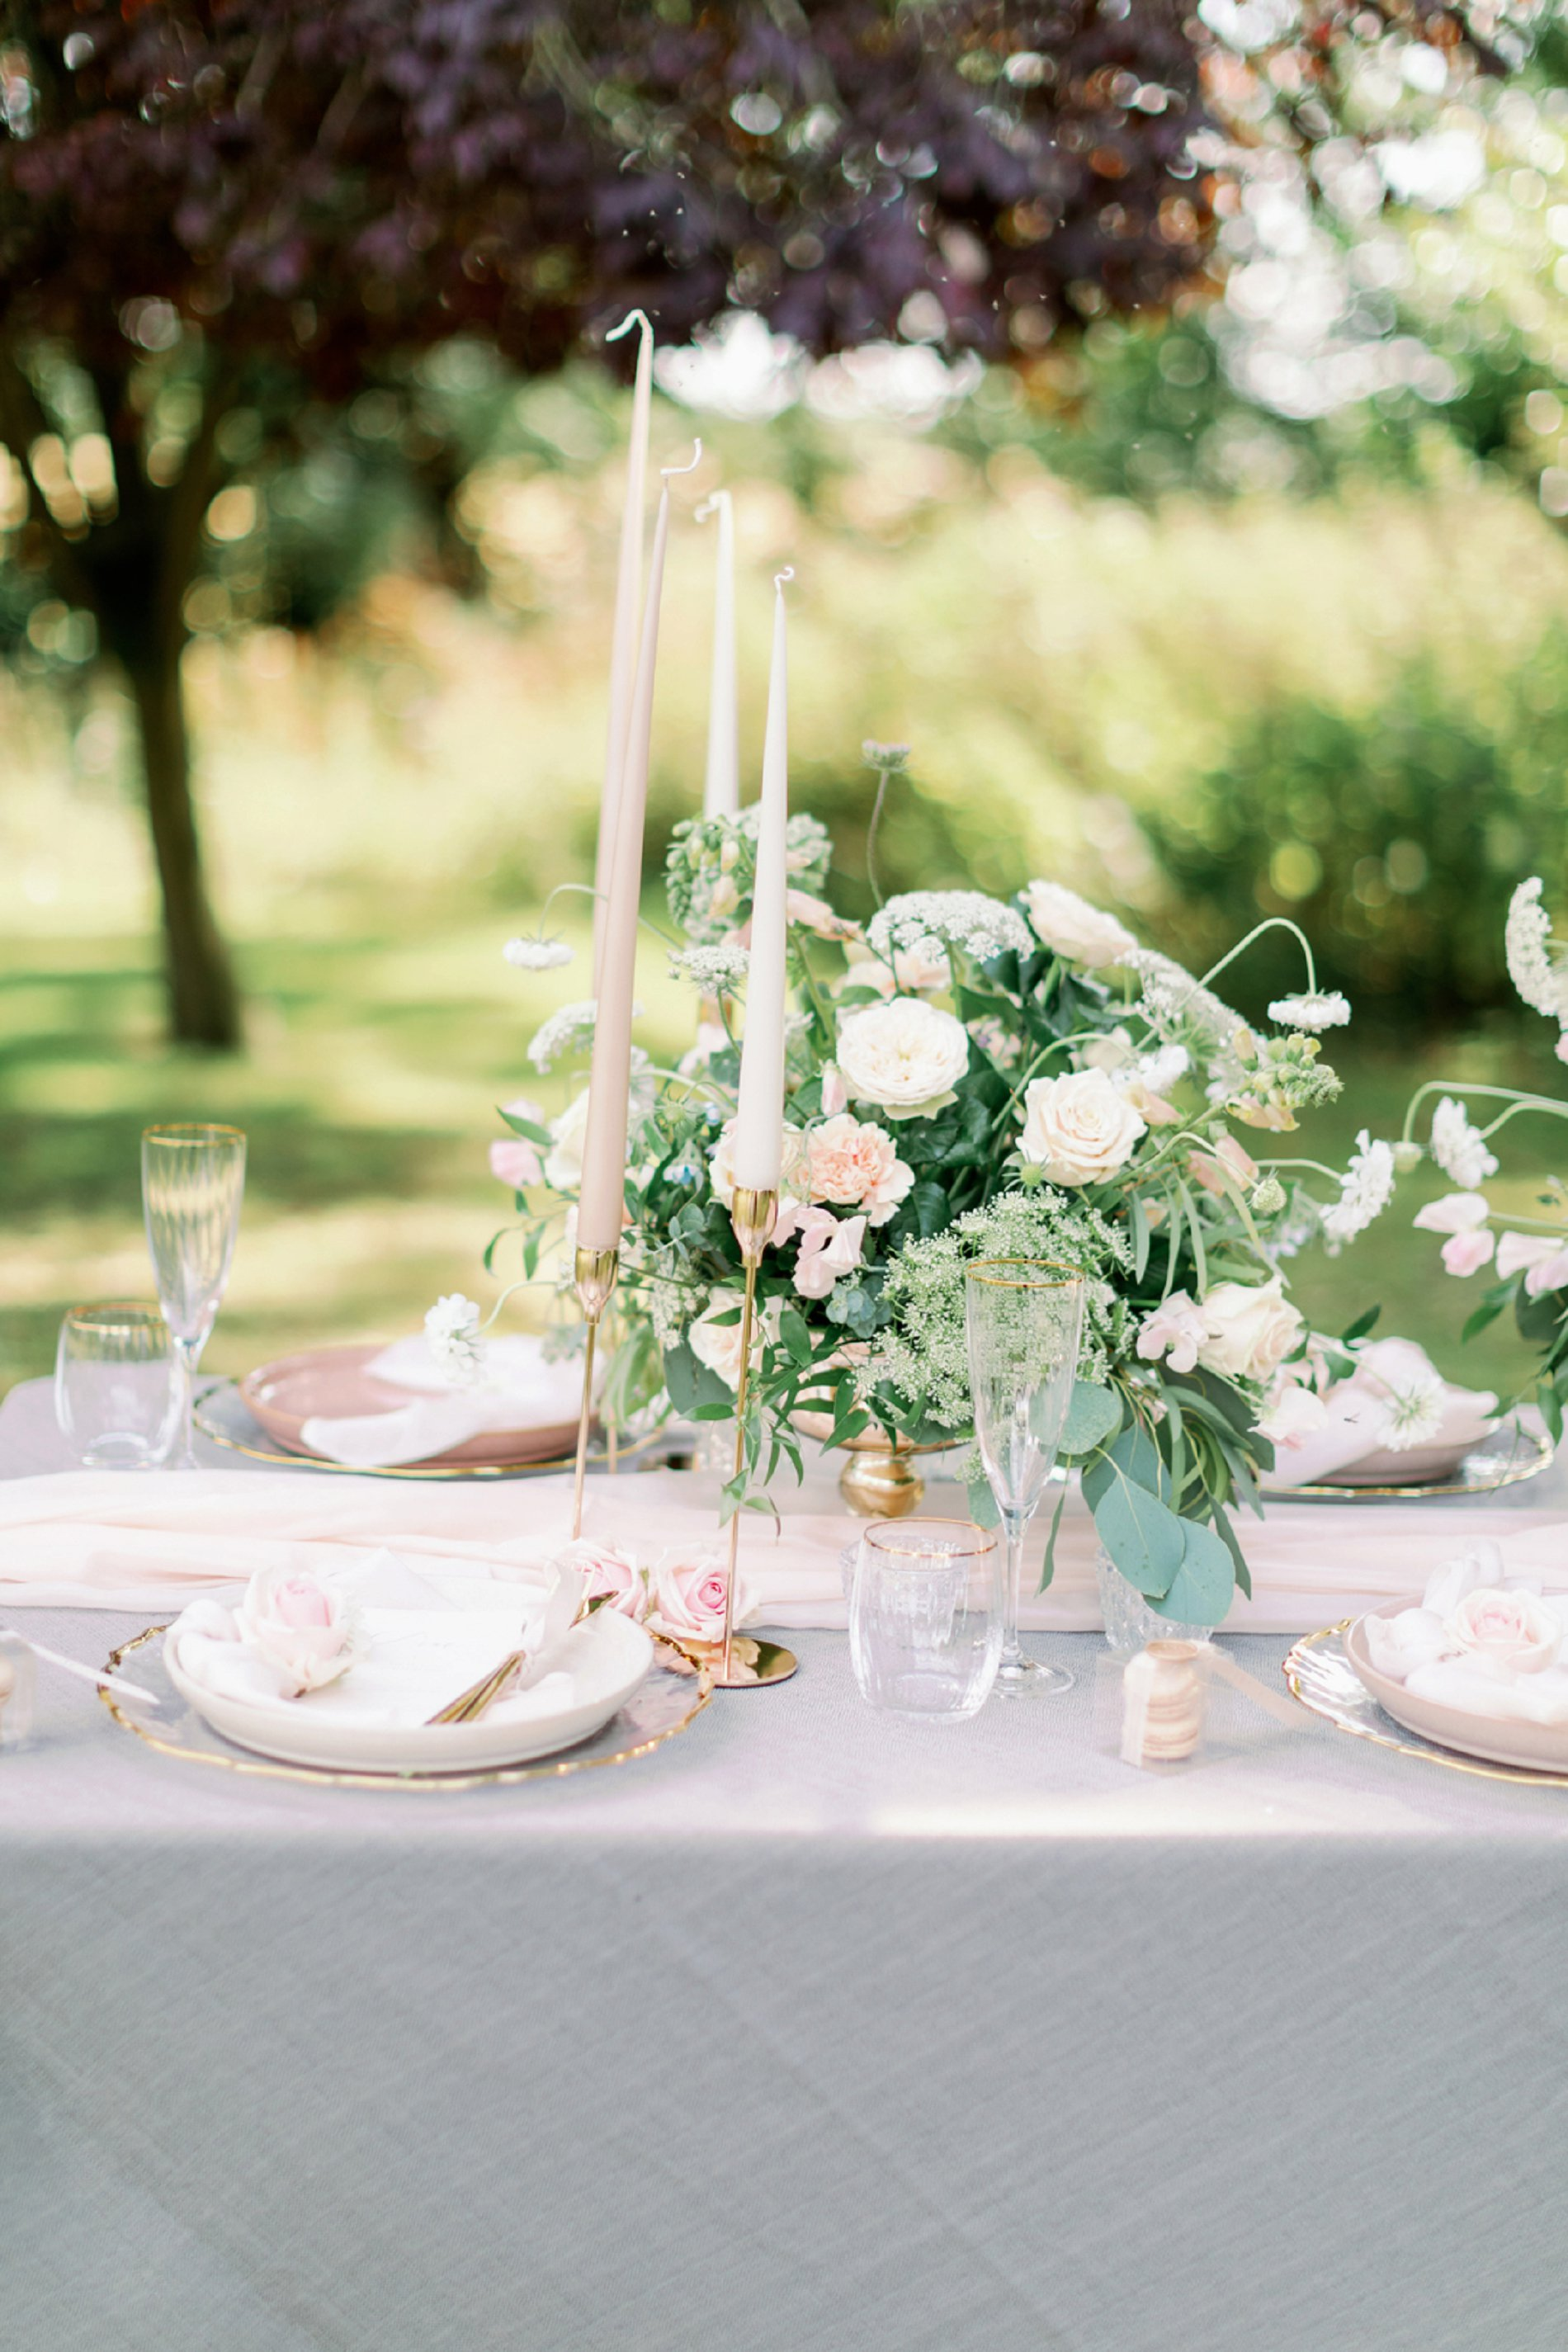 An Elegant Styled Shoot at Baddow Park House (c) Camilla J Hards (47)